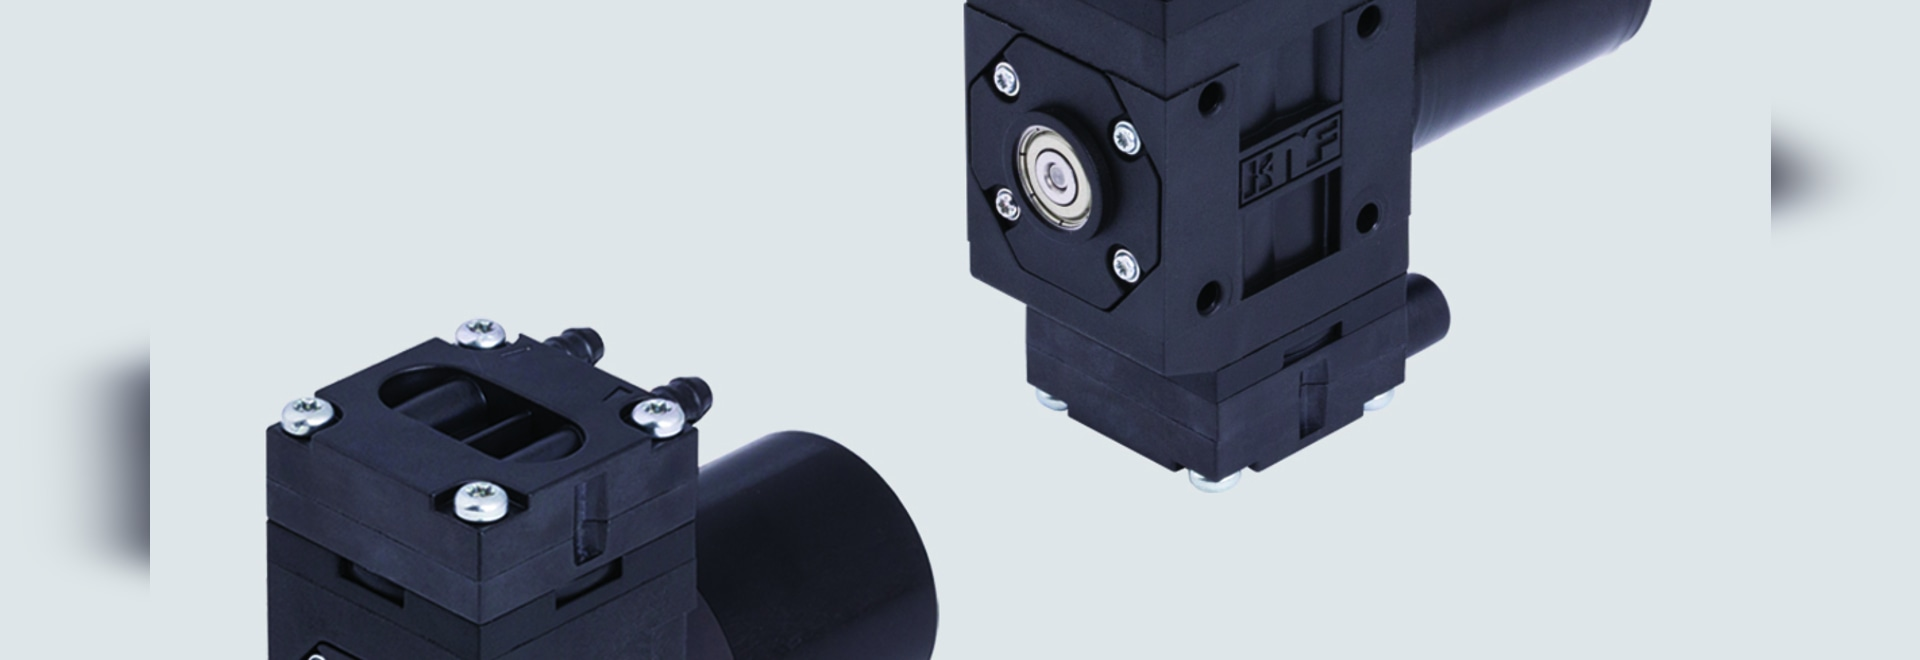 Gas-Pumpe kommt in kompakte Größe